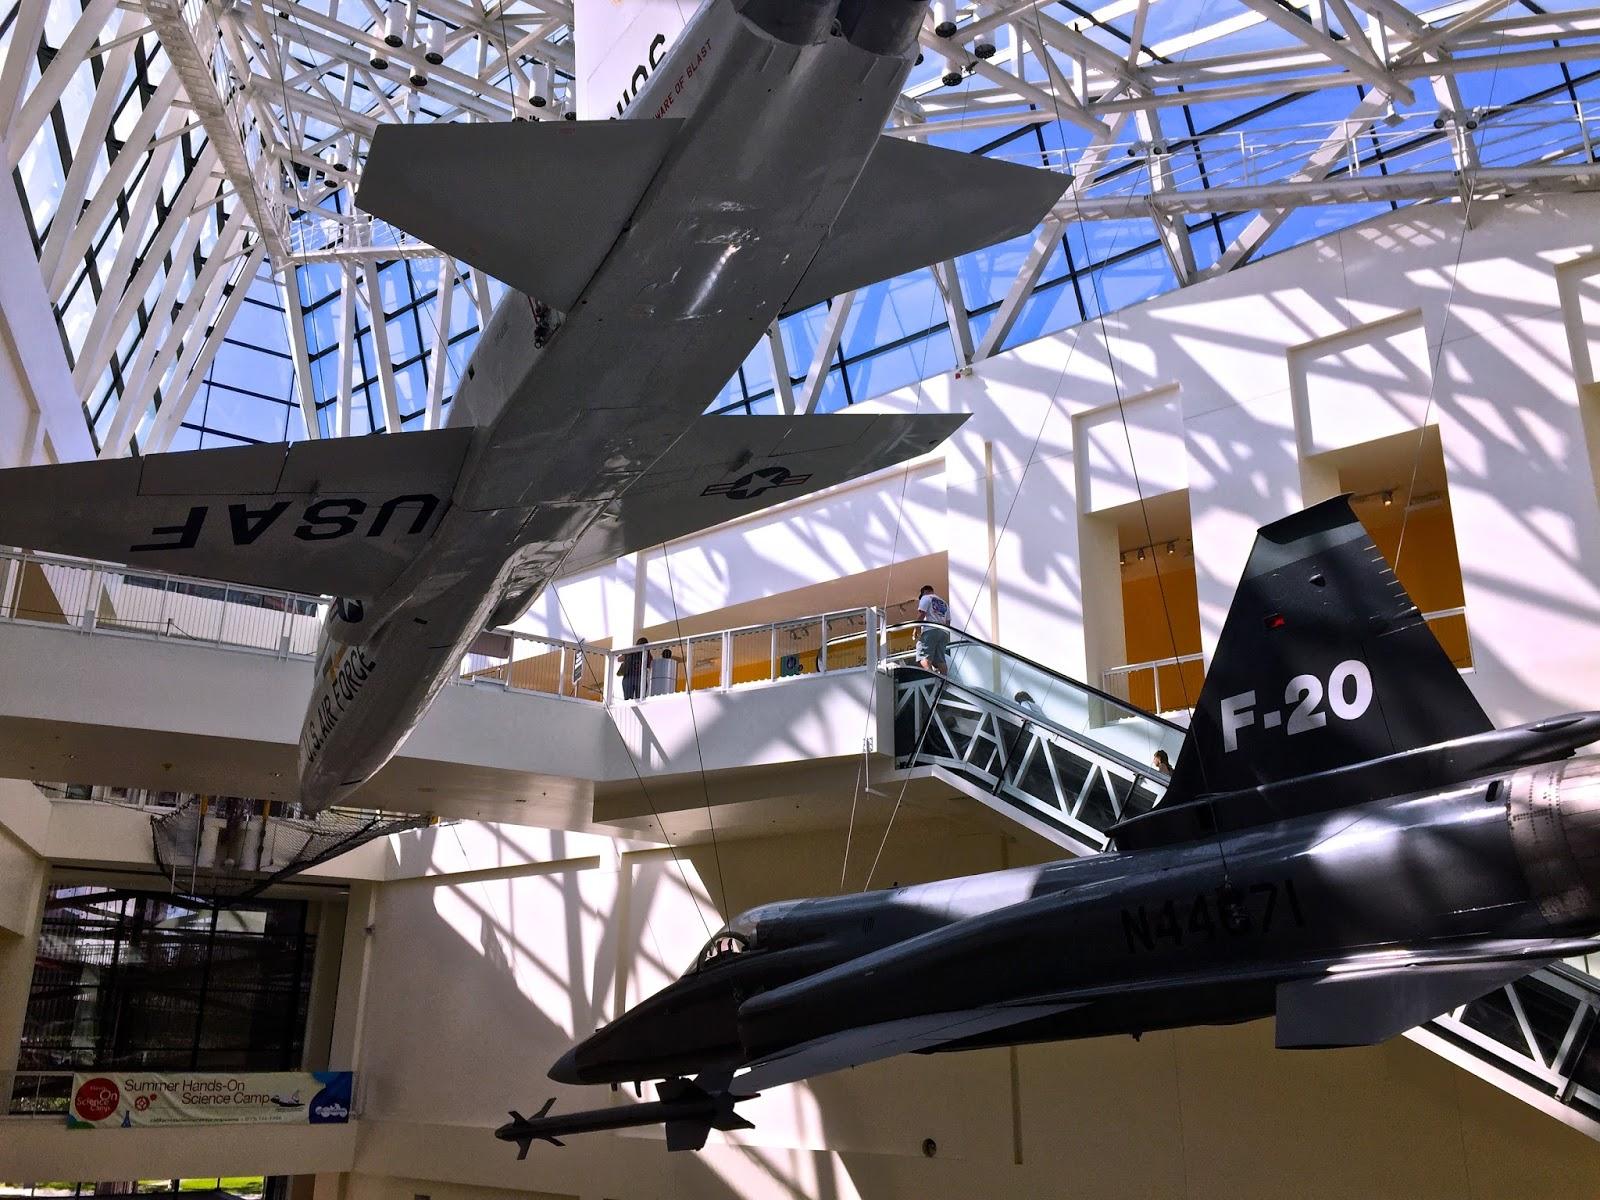 nasa california science center - photo #11